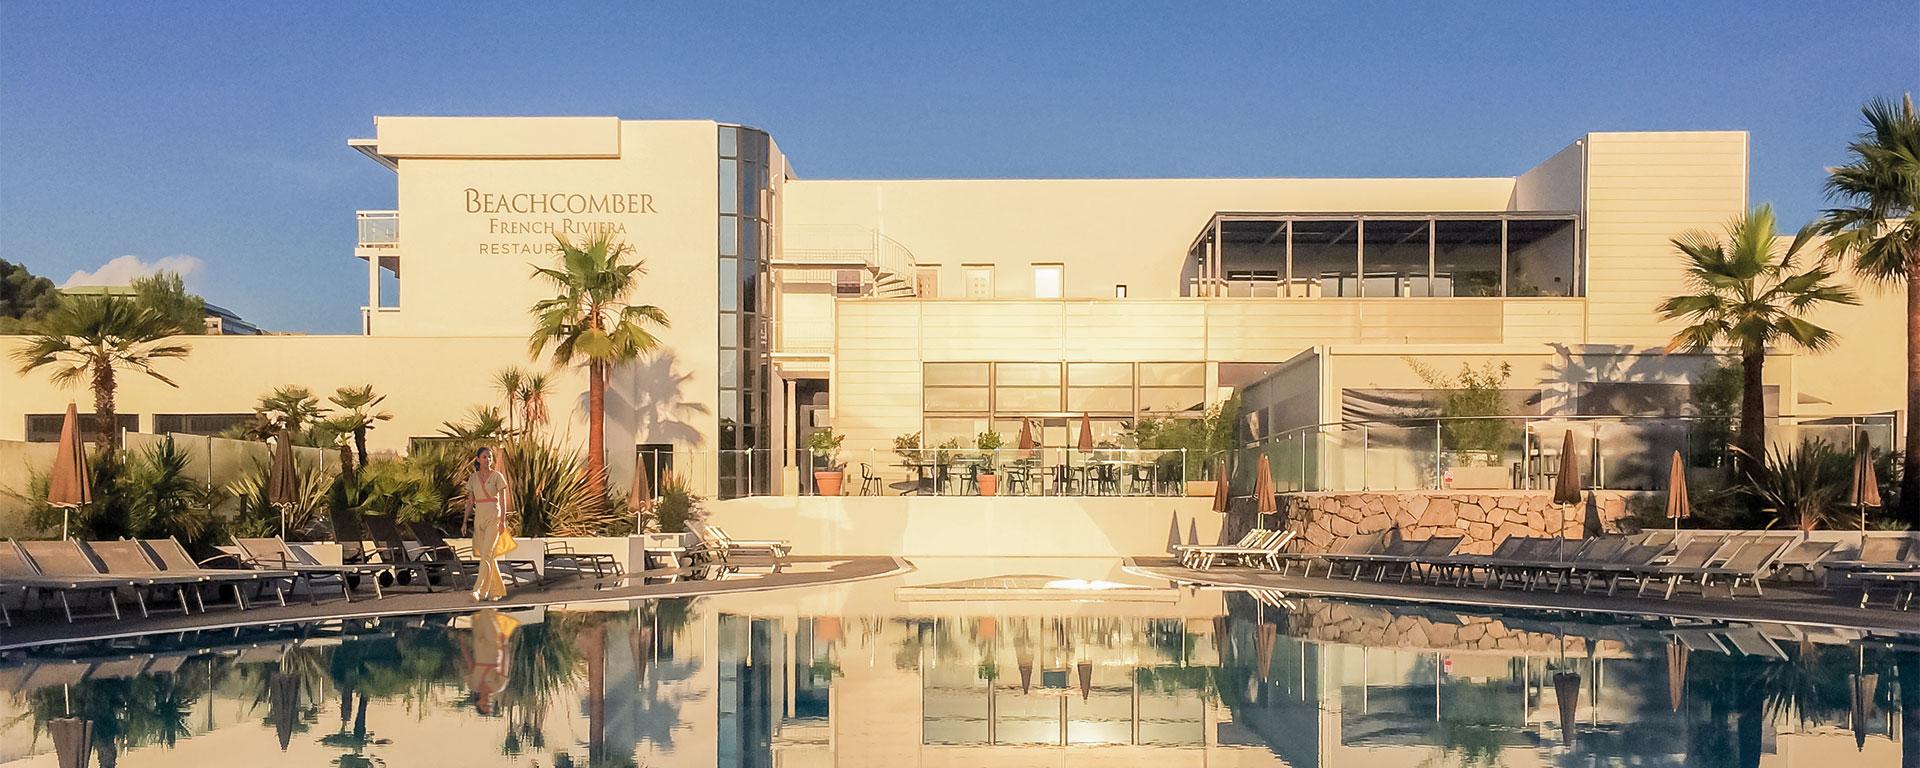 Beachcomber French Riviera Resort And Spa